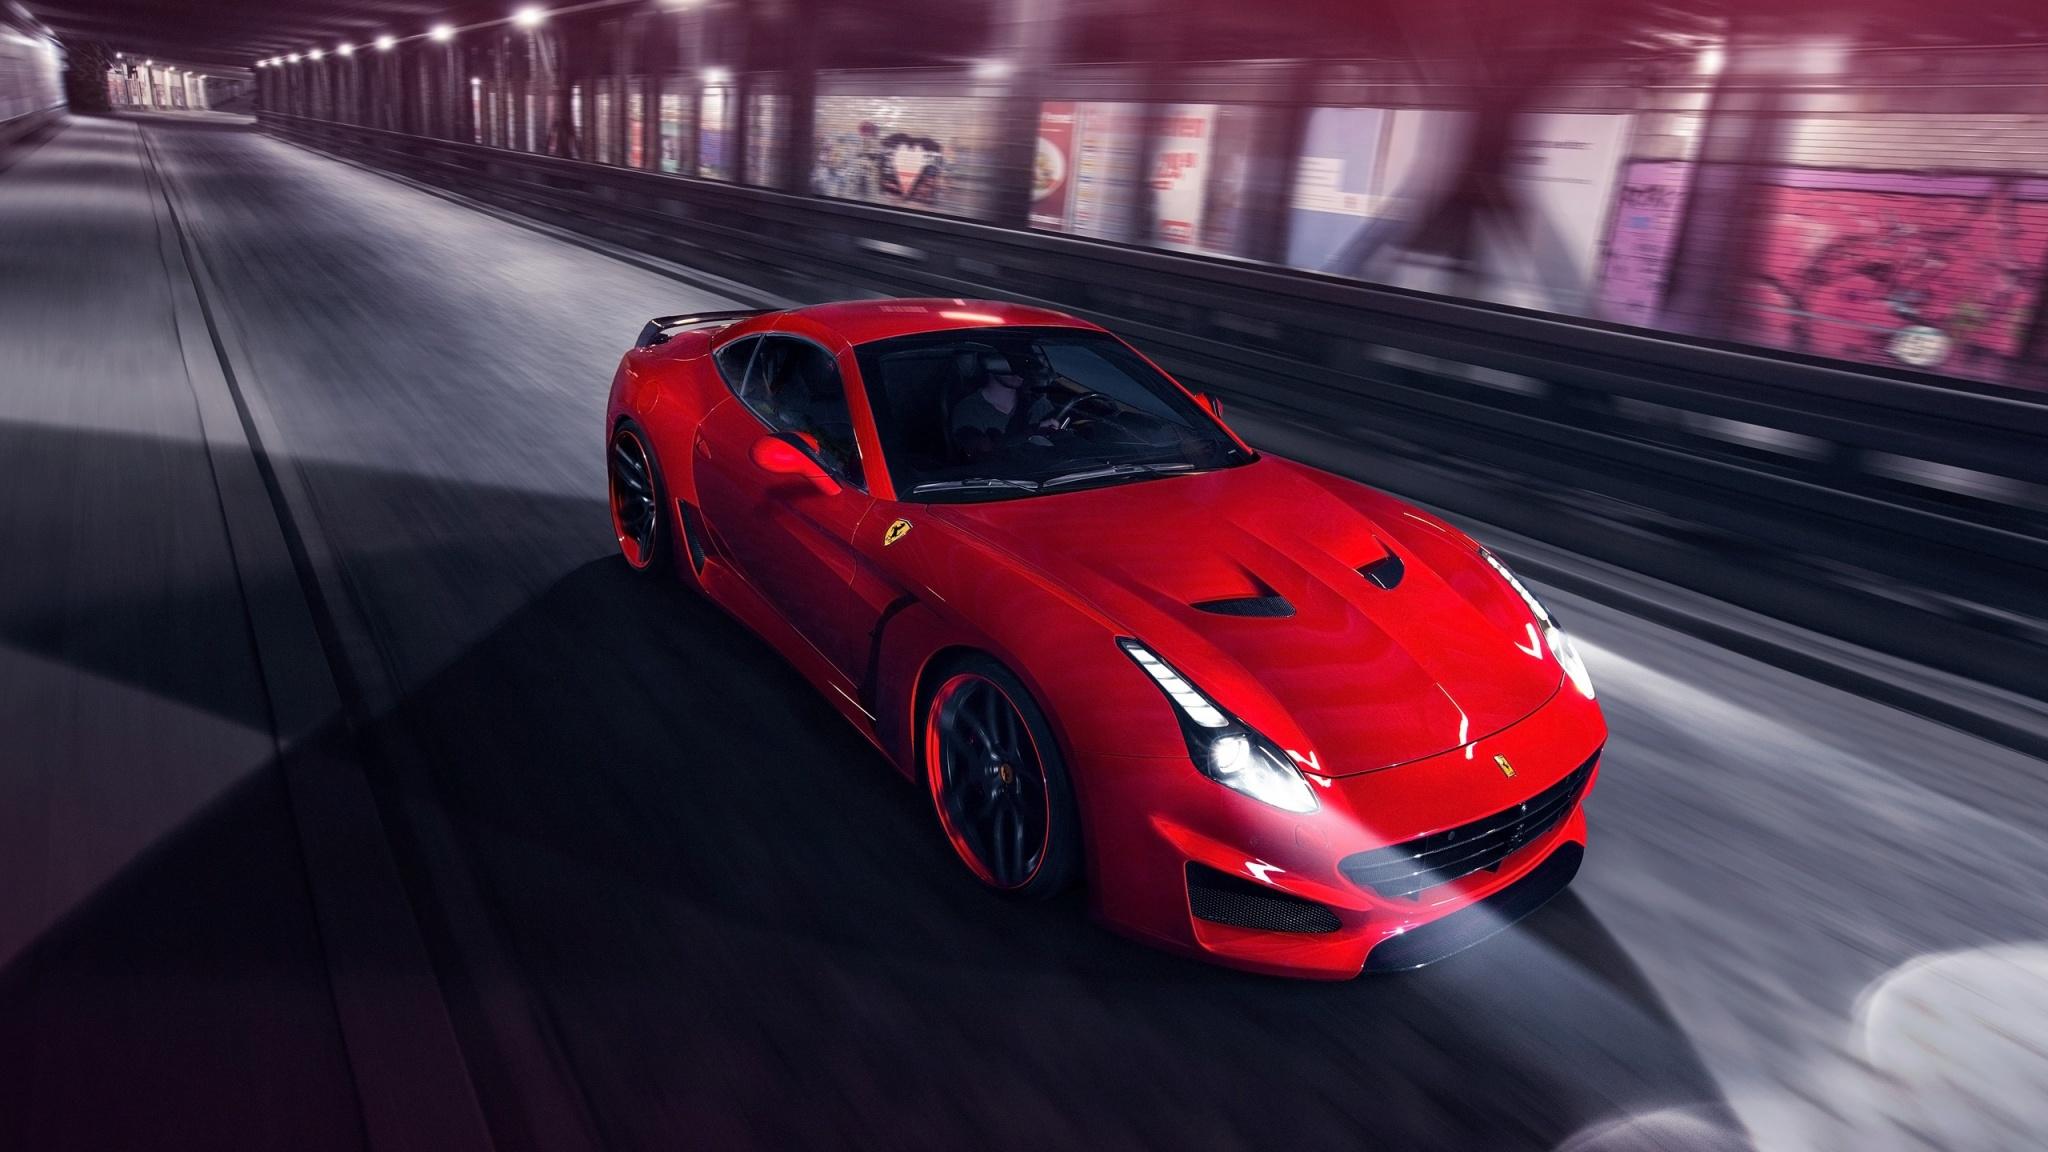 Download Red Black Ferrari 2048 X 2048 Wallpapers: Red Novitec Rosso Ferrari California T N-Largo 2015